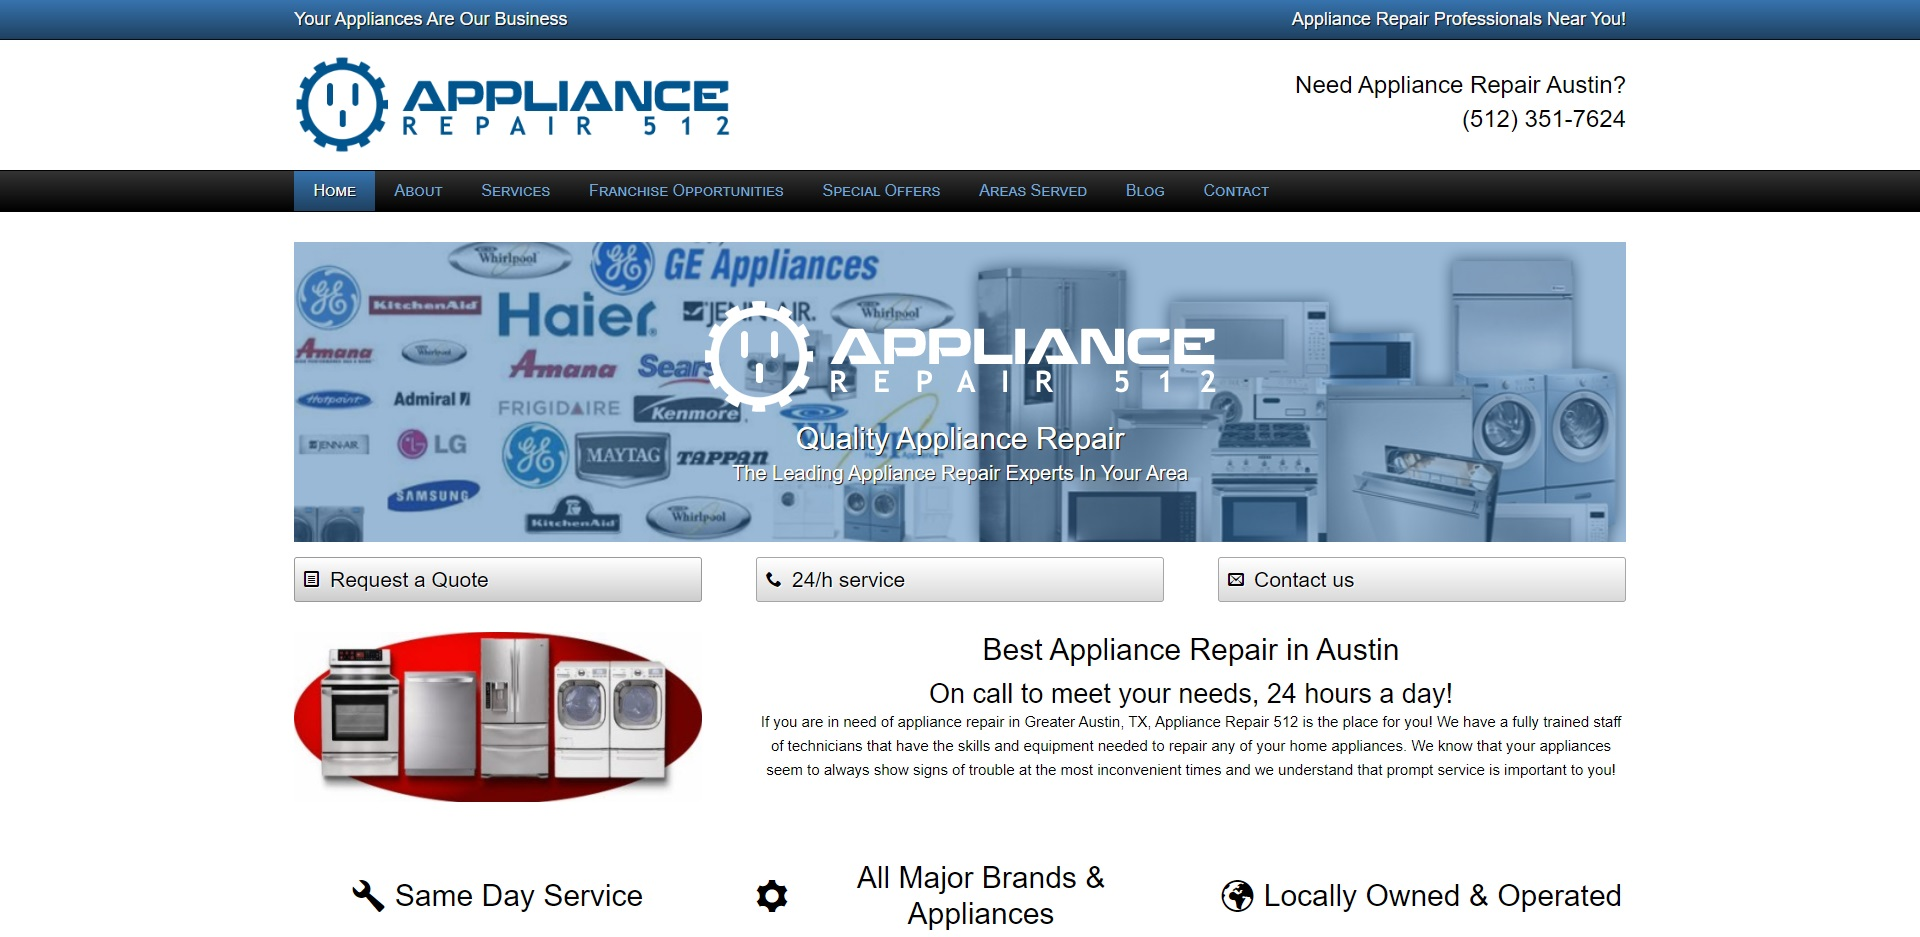 Best Appliance Repairs in Austin